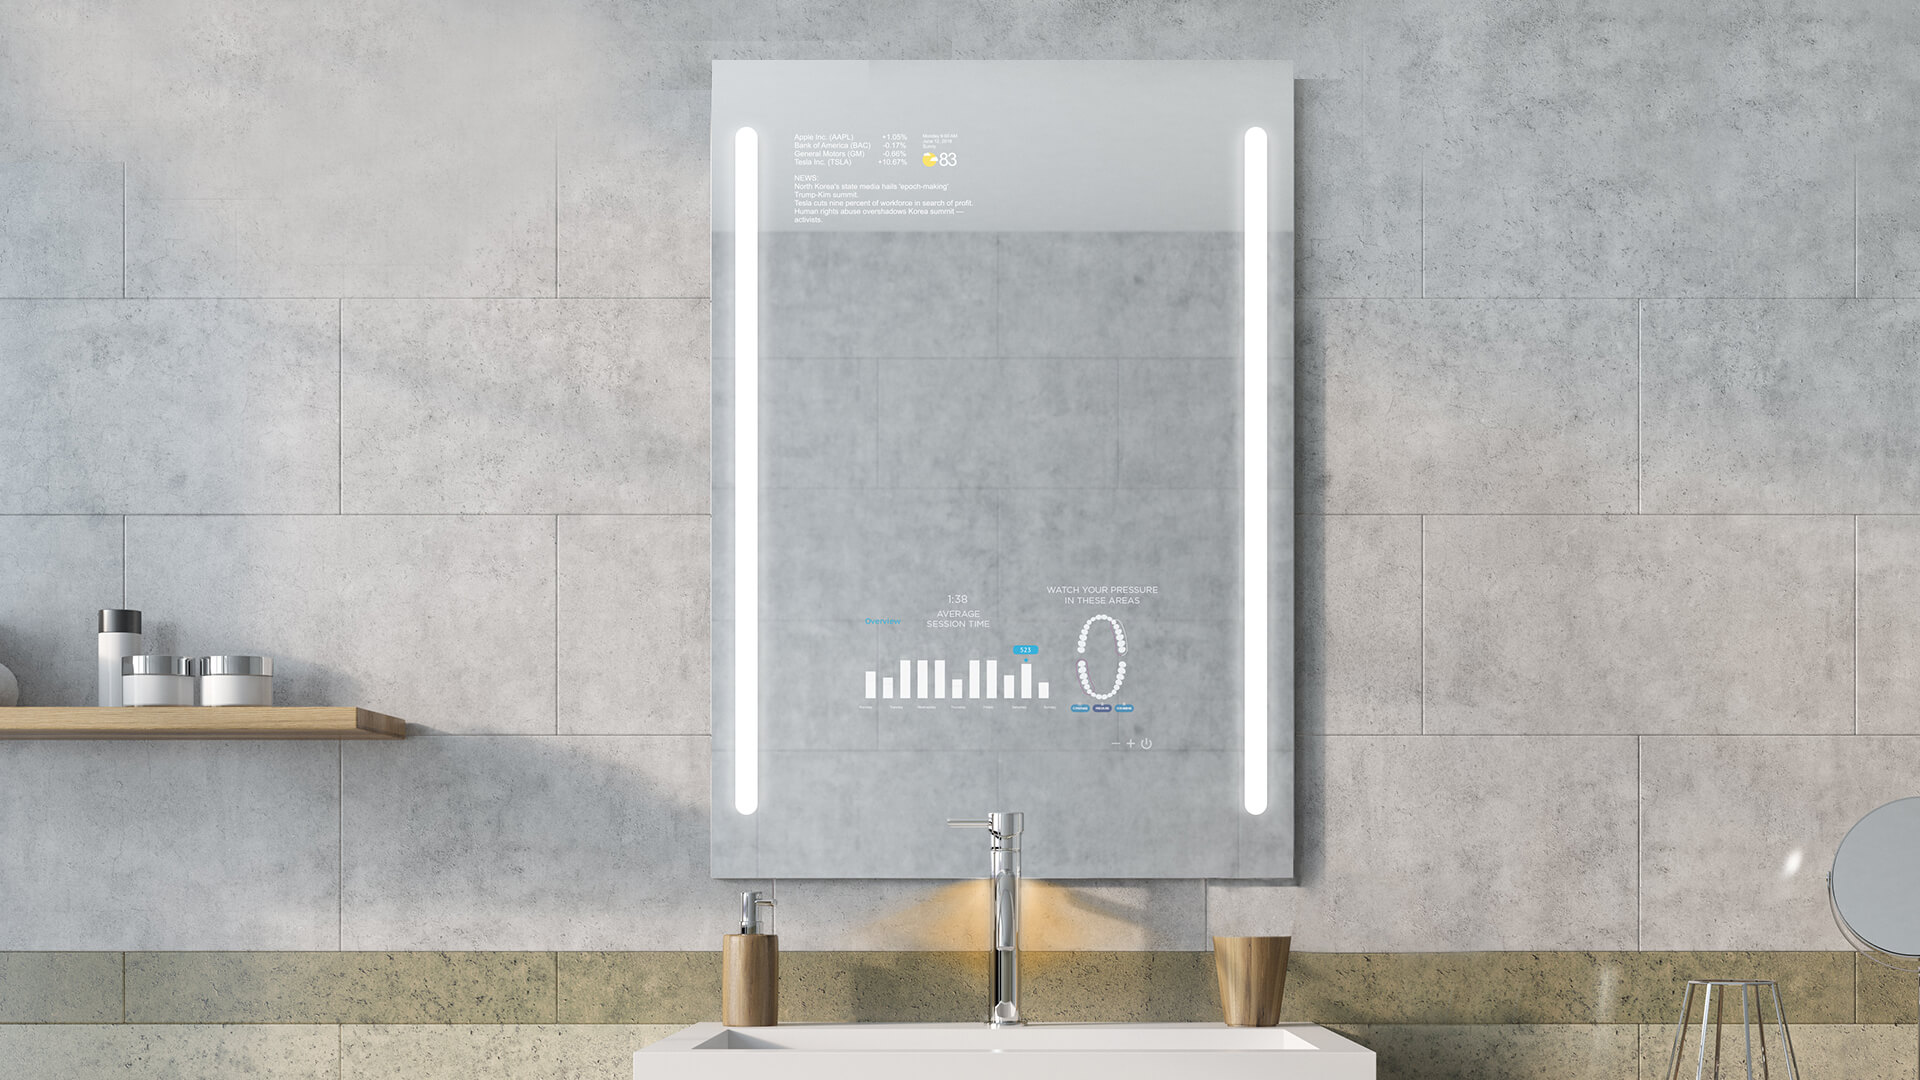 Qaio Smart Mirror